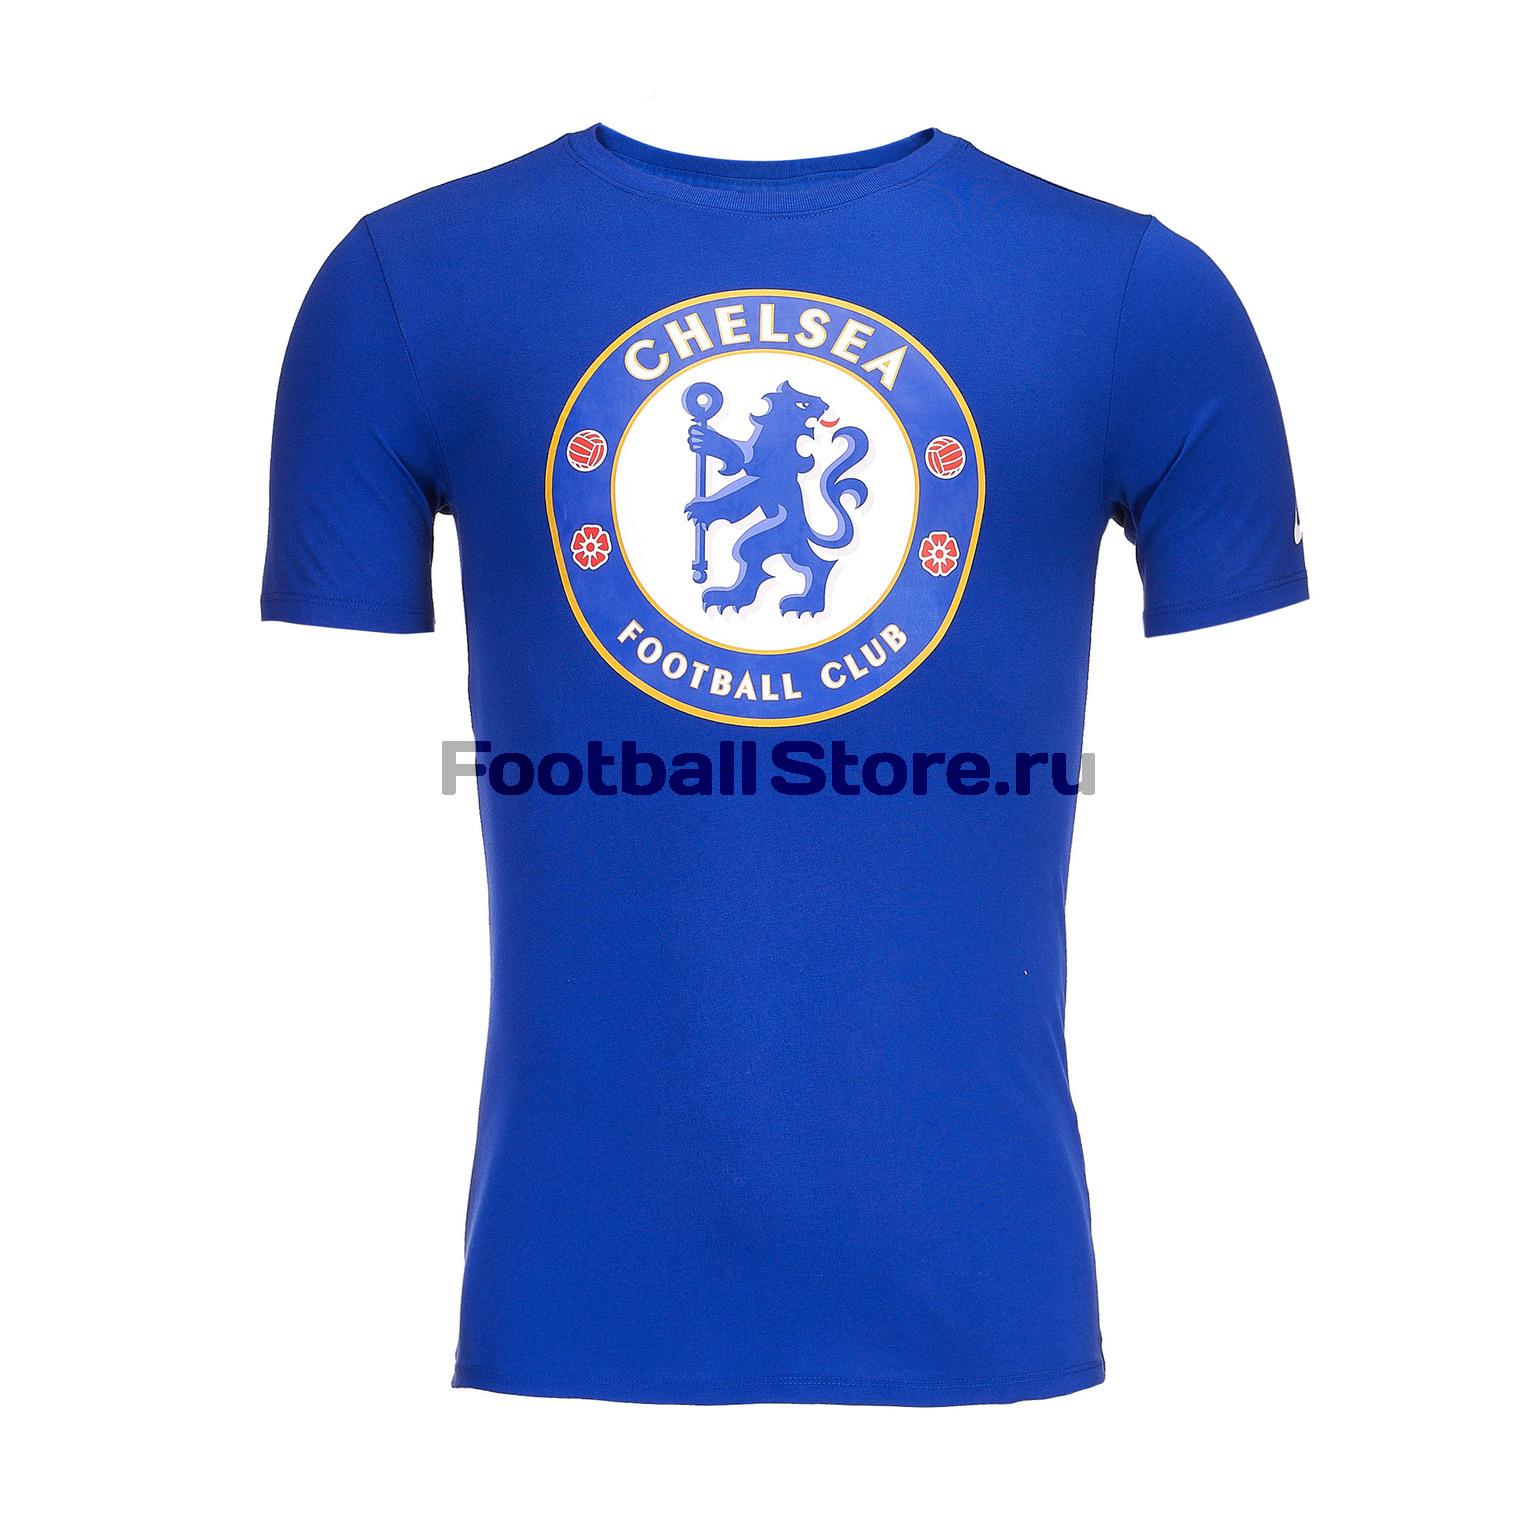 Футболка Nike Chelsea Tee Evergreen Crest 910897-495 футболка nike f c tee foil 810505 101